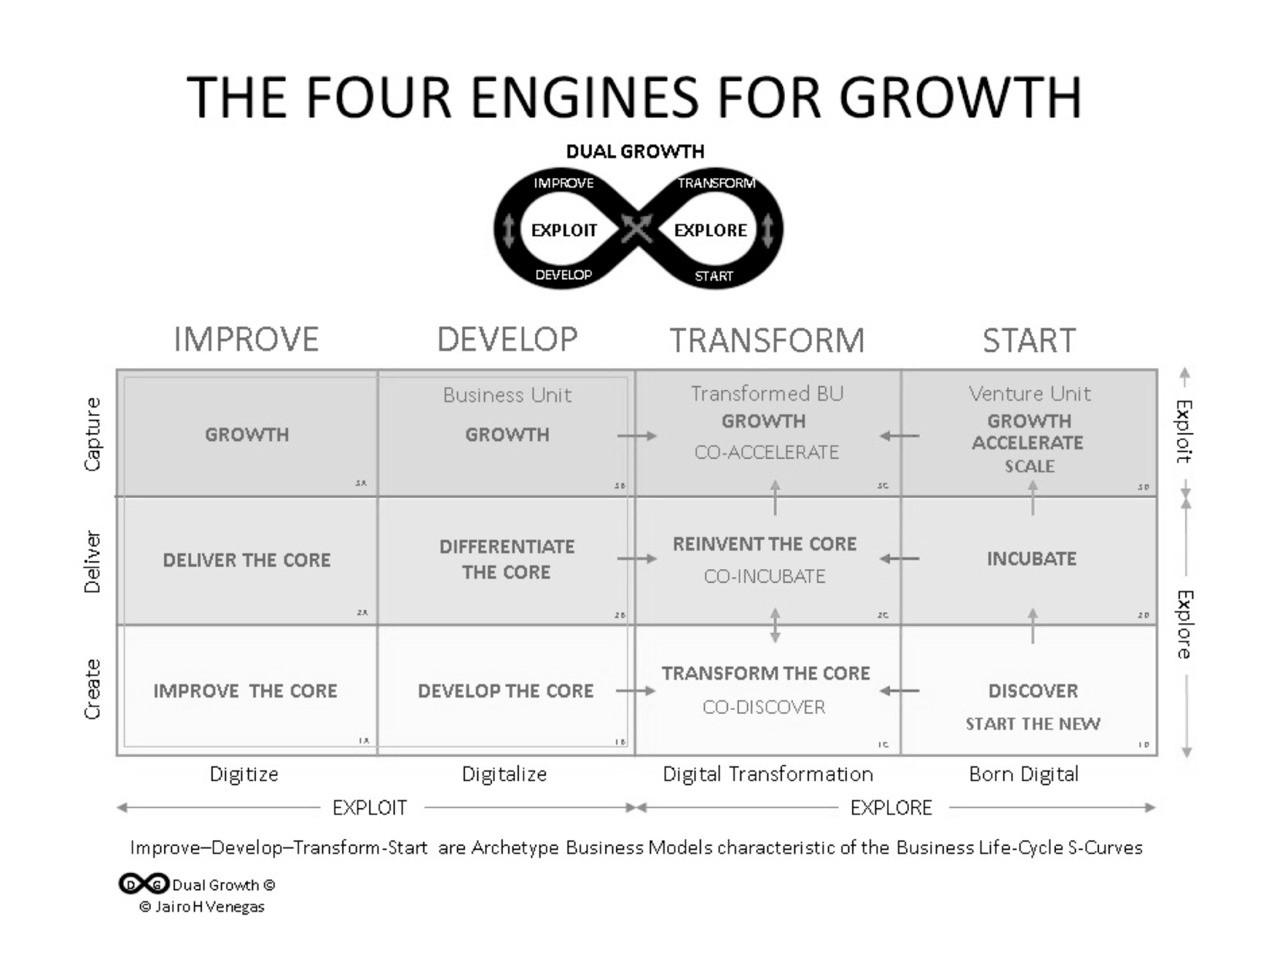 Estrategia para Crear Valor cover image